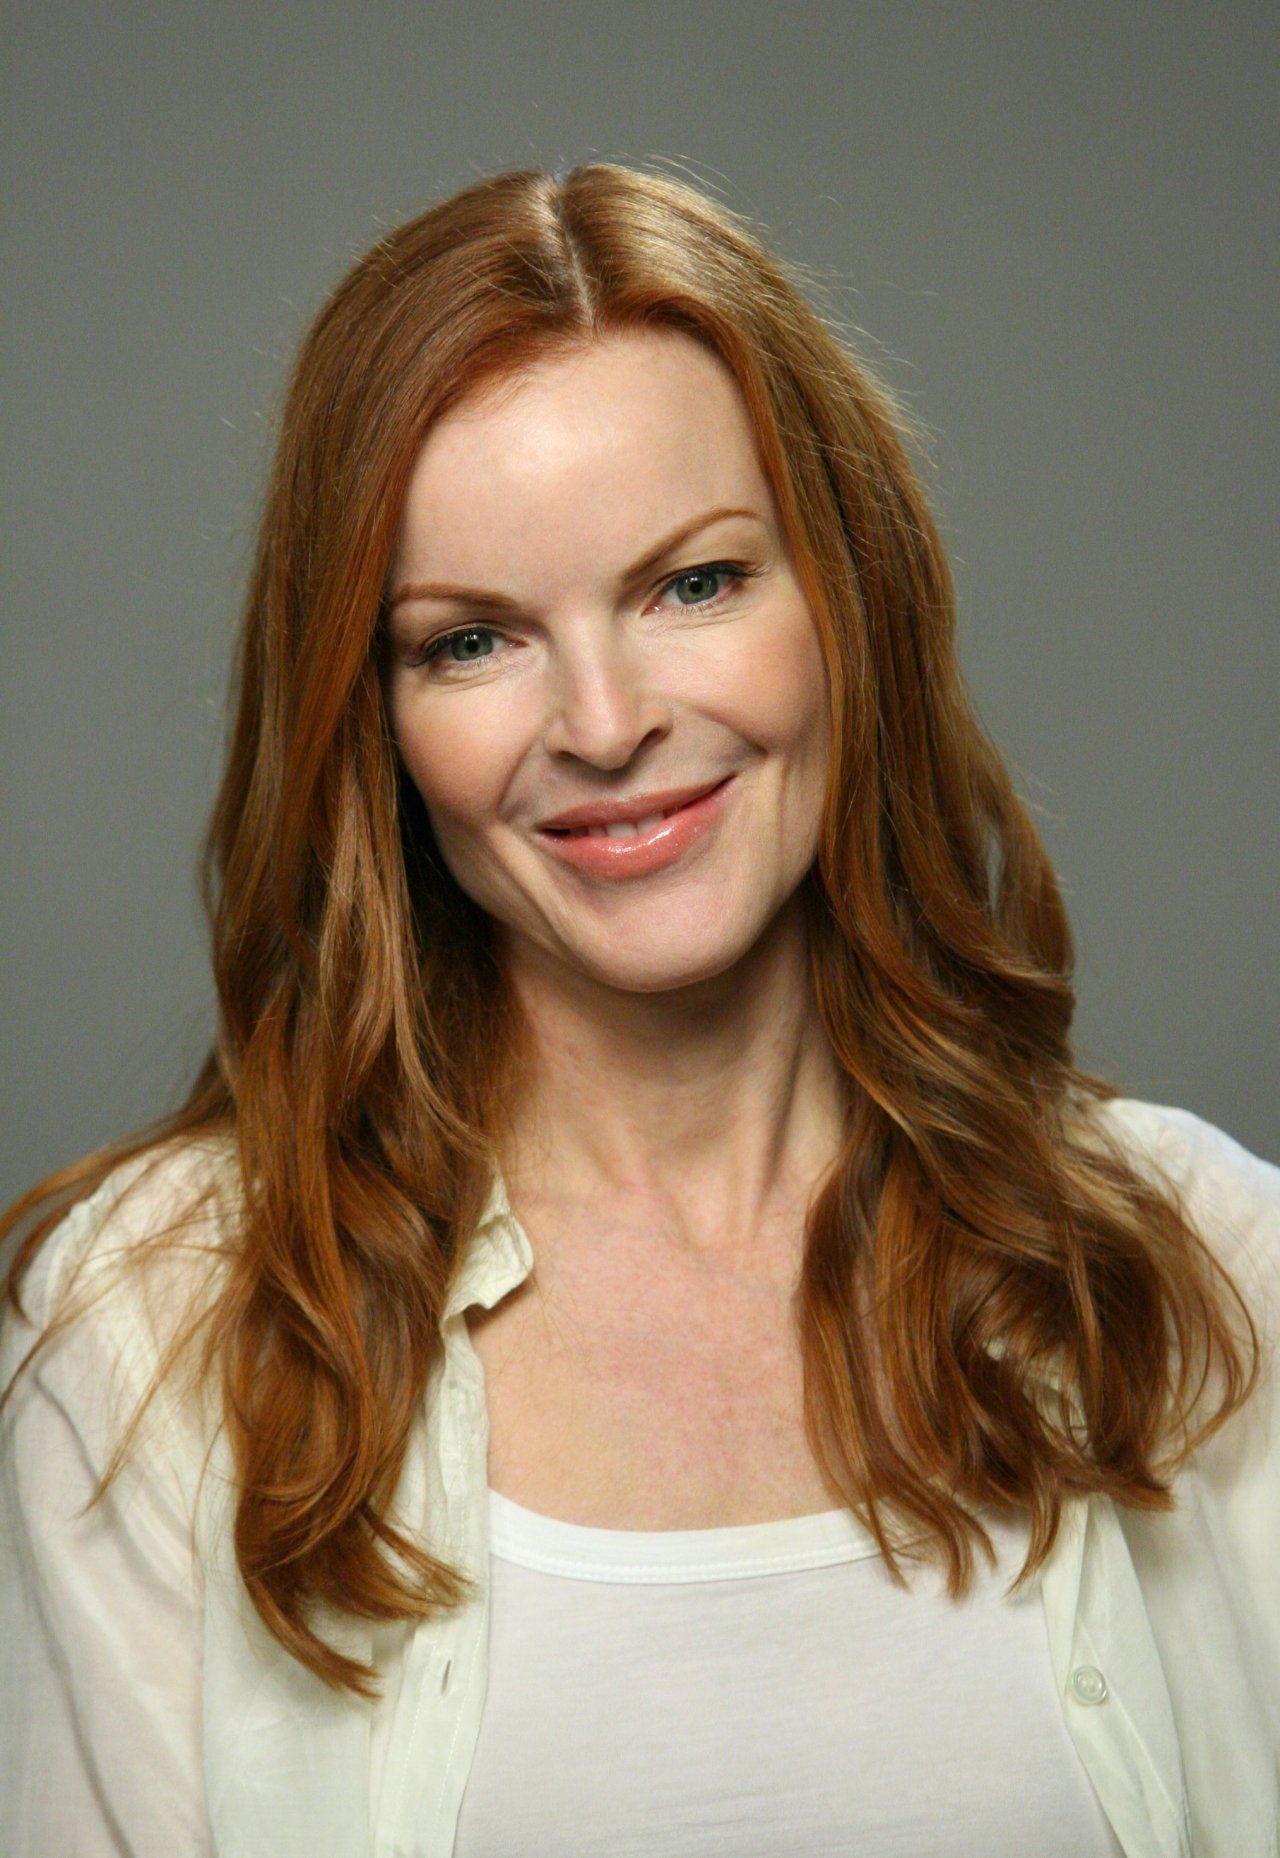 Ilona Rodgers,Leilani Bishop XXX video Lark Voorhies born March 25, 1974 (age 44),Emily Stevens (actress)